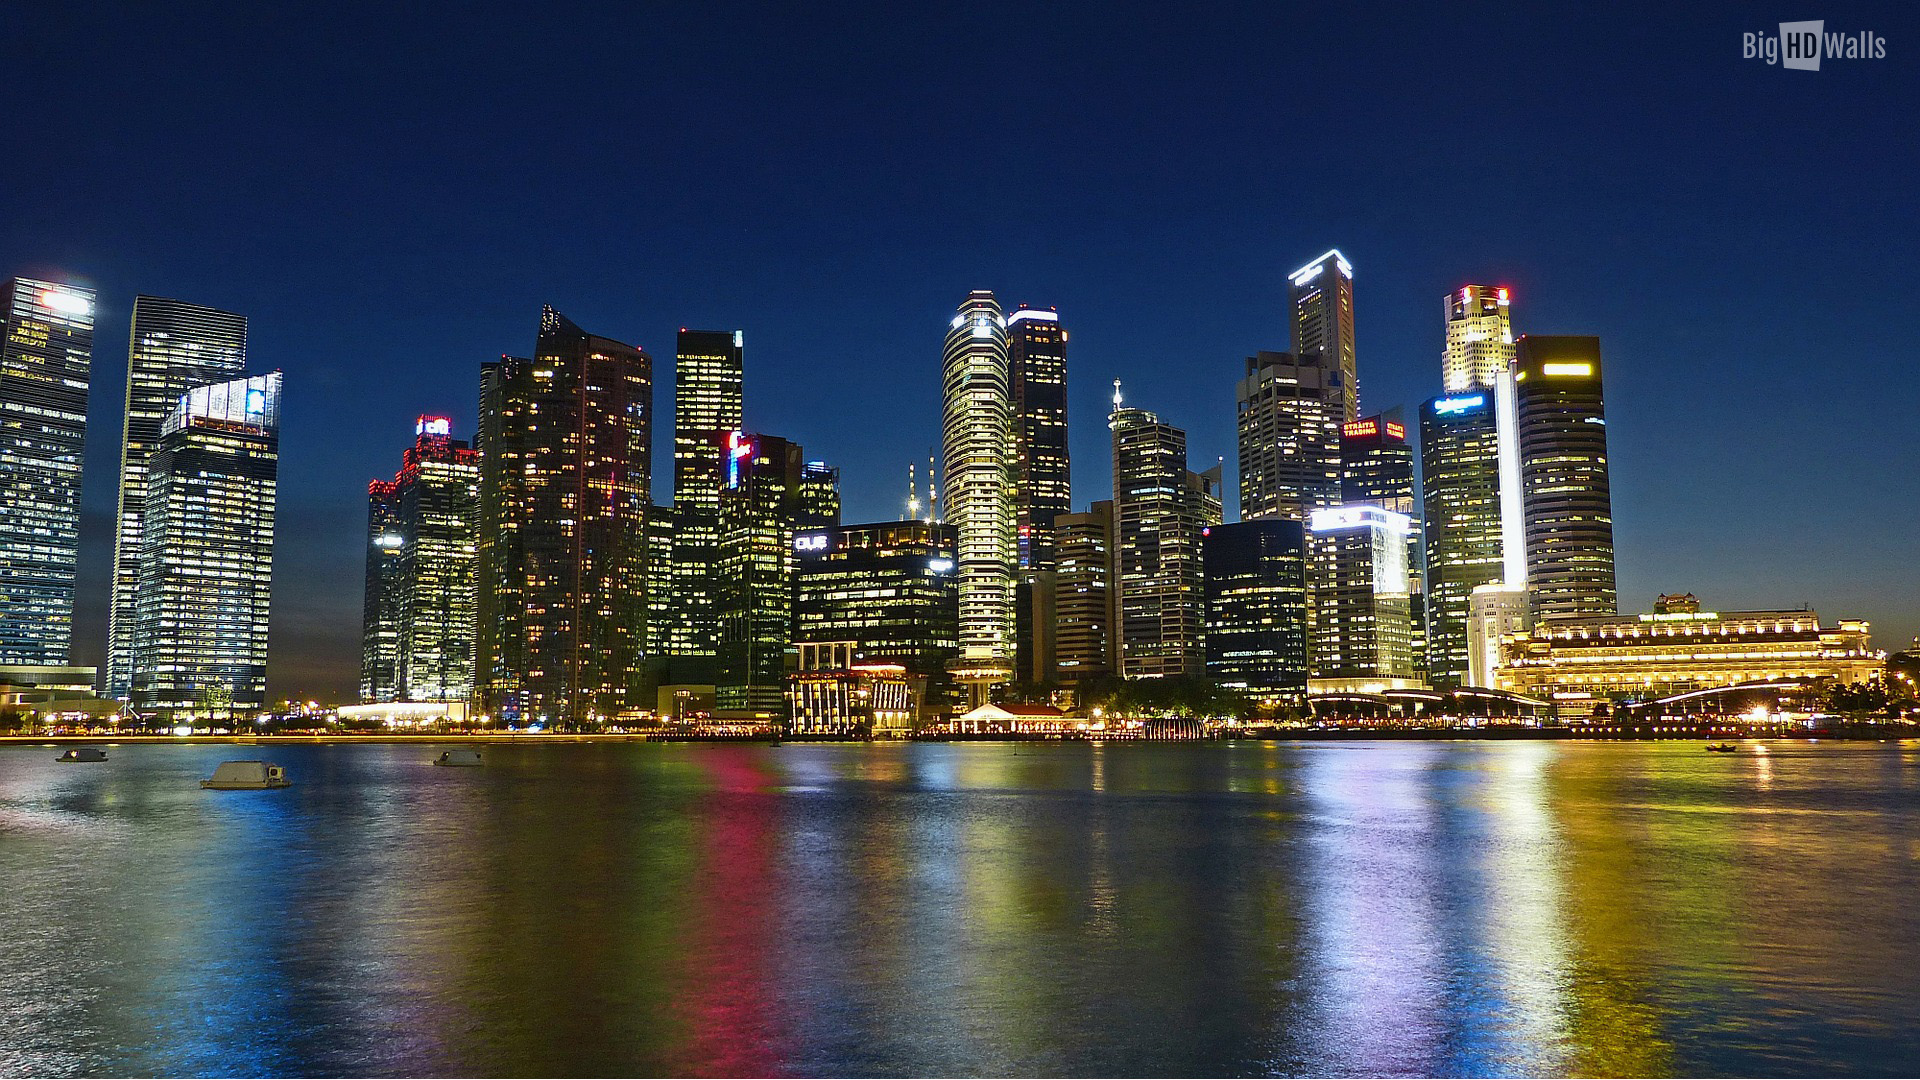 singapore-skyline-at-night-hd-wallpaper.jpg